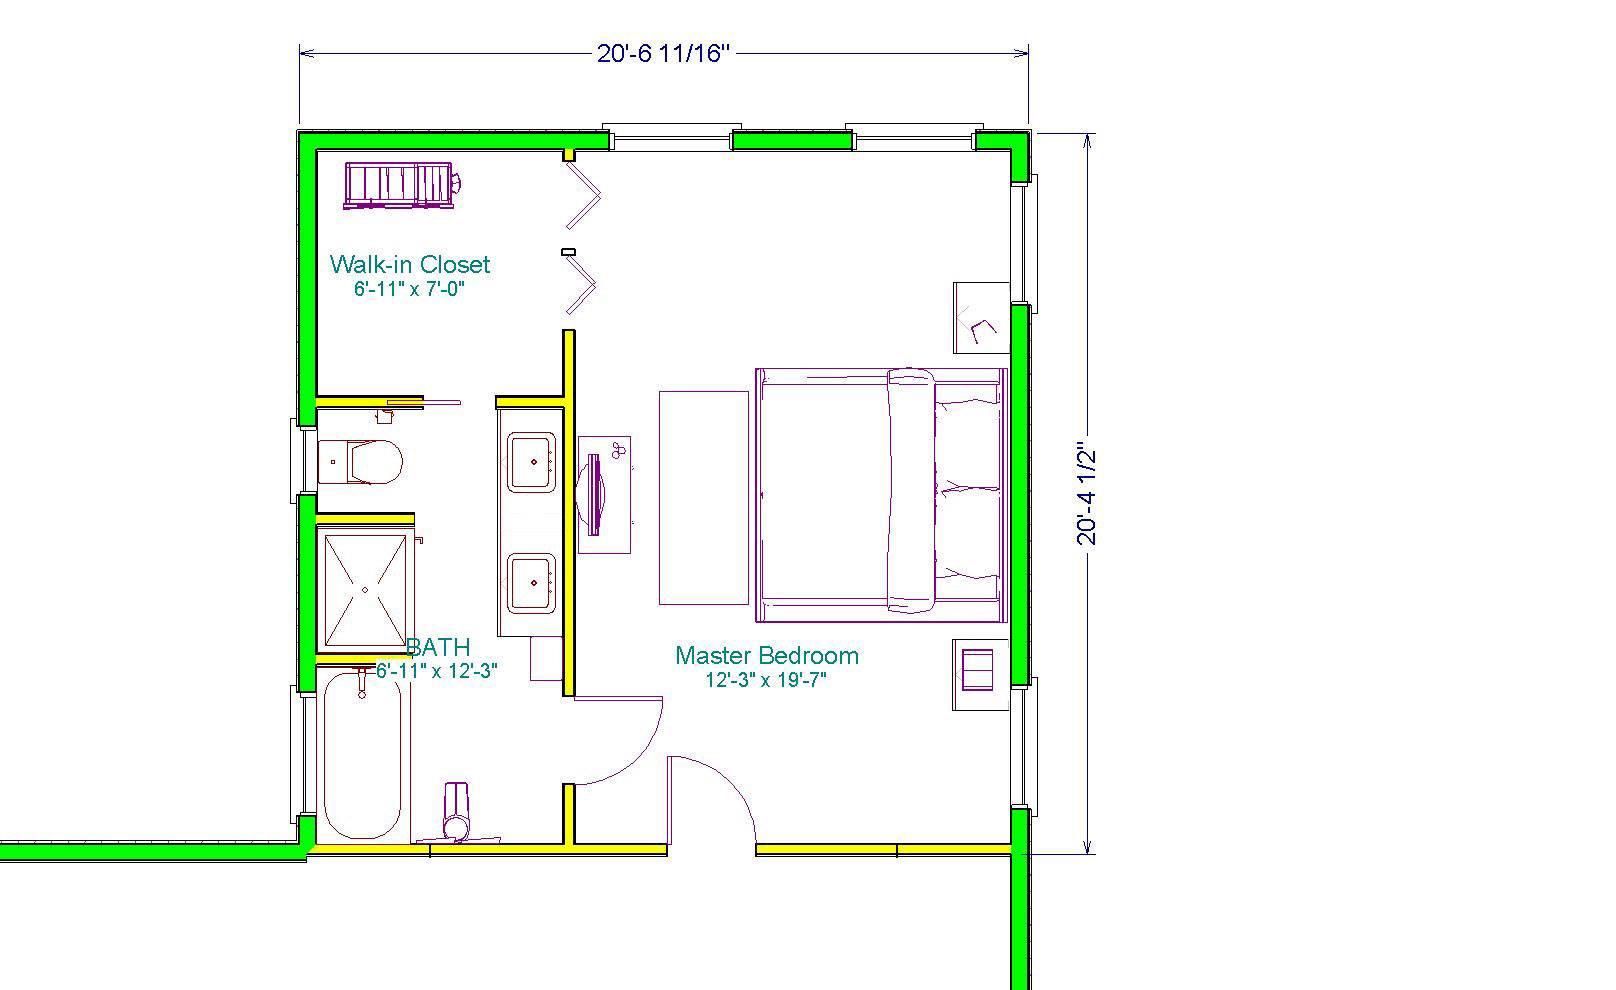 Bedroom Master Floor Plan Addition Plans House Plans 79870